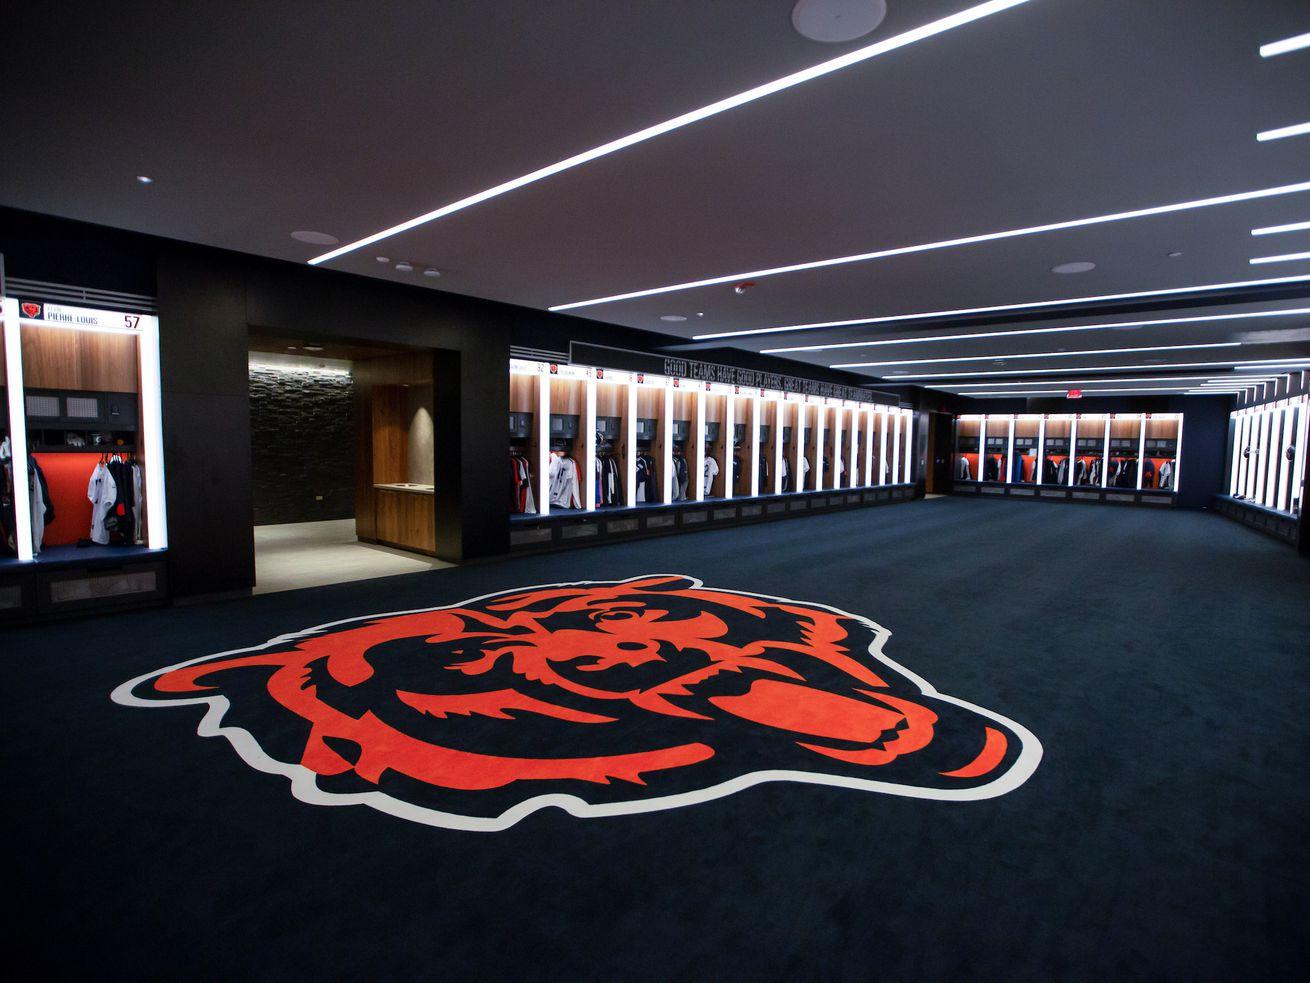 Locker room at the new Halas Hall, Saturday, August 24, 2019, in Lake Forest, Illinois. | Matt Sisneros/Chicago Bears